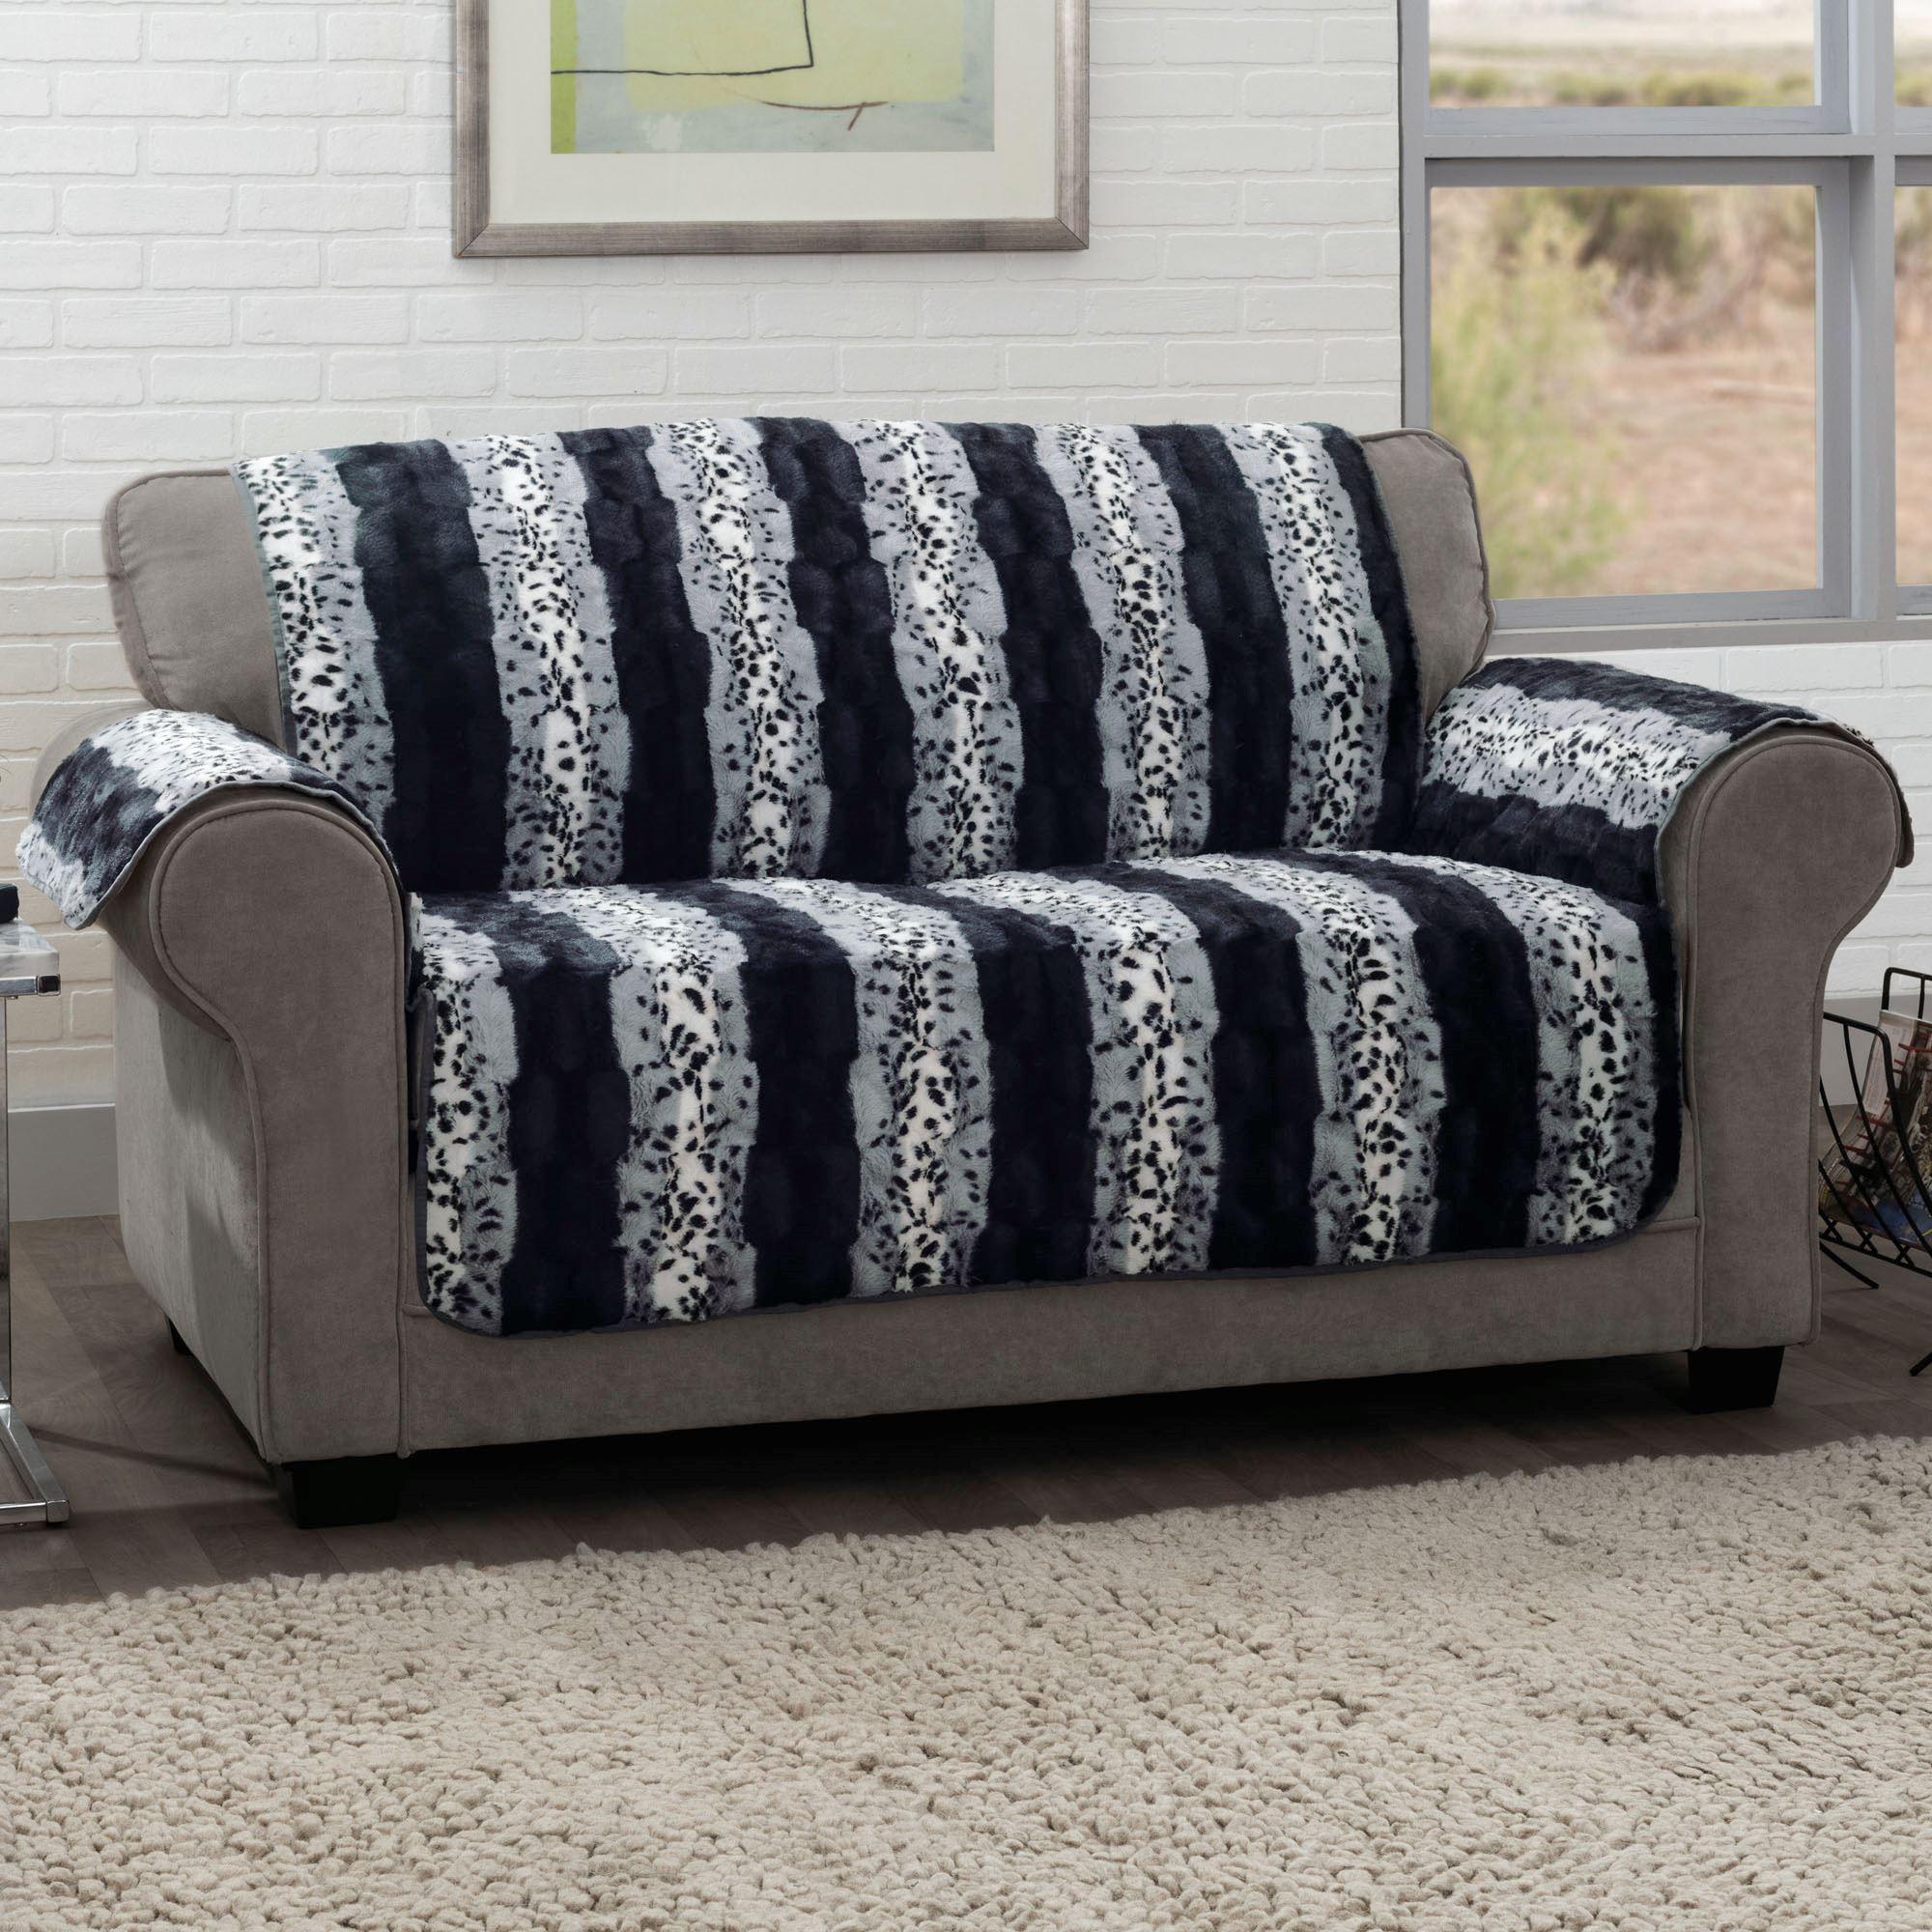 Prowl Black Faux Fur Animal Print Furniture Protectors For Animal Print Sofas (Image 12 of 20)